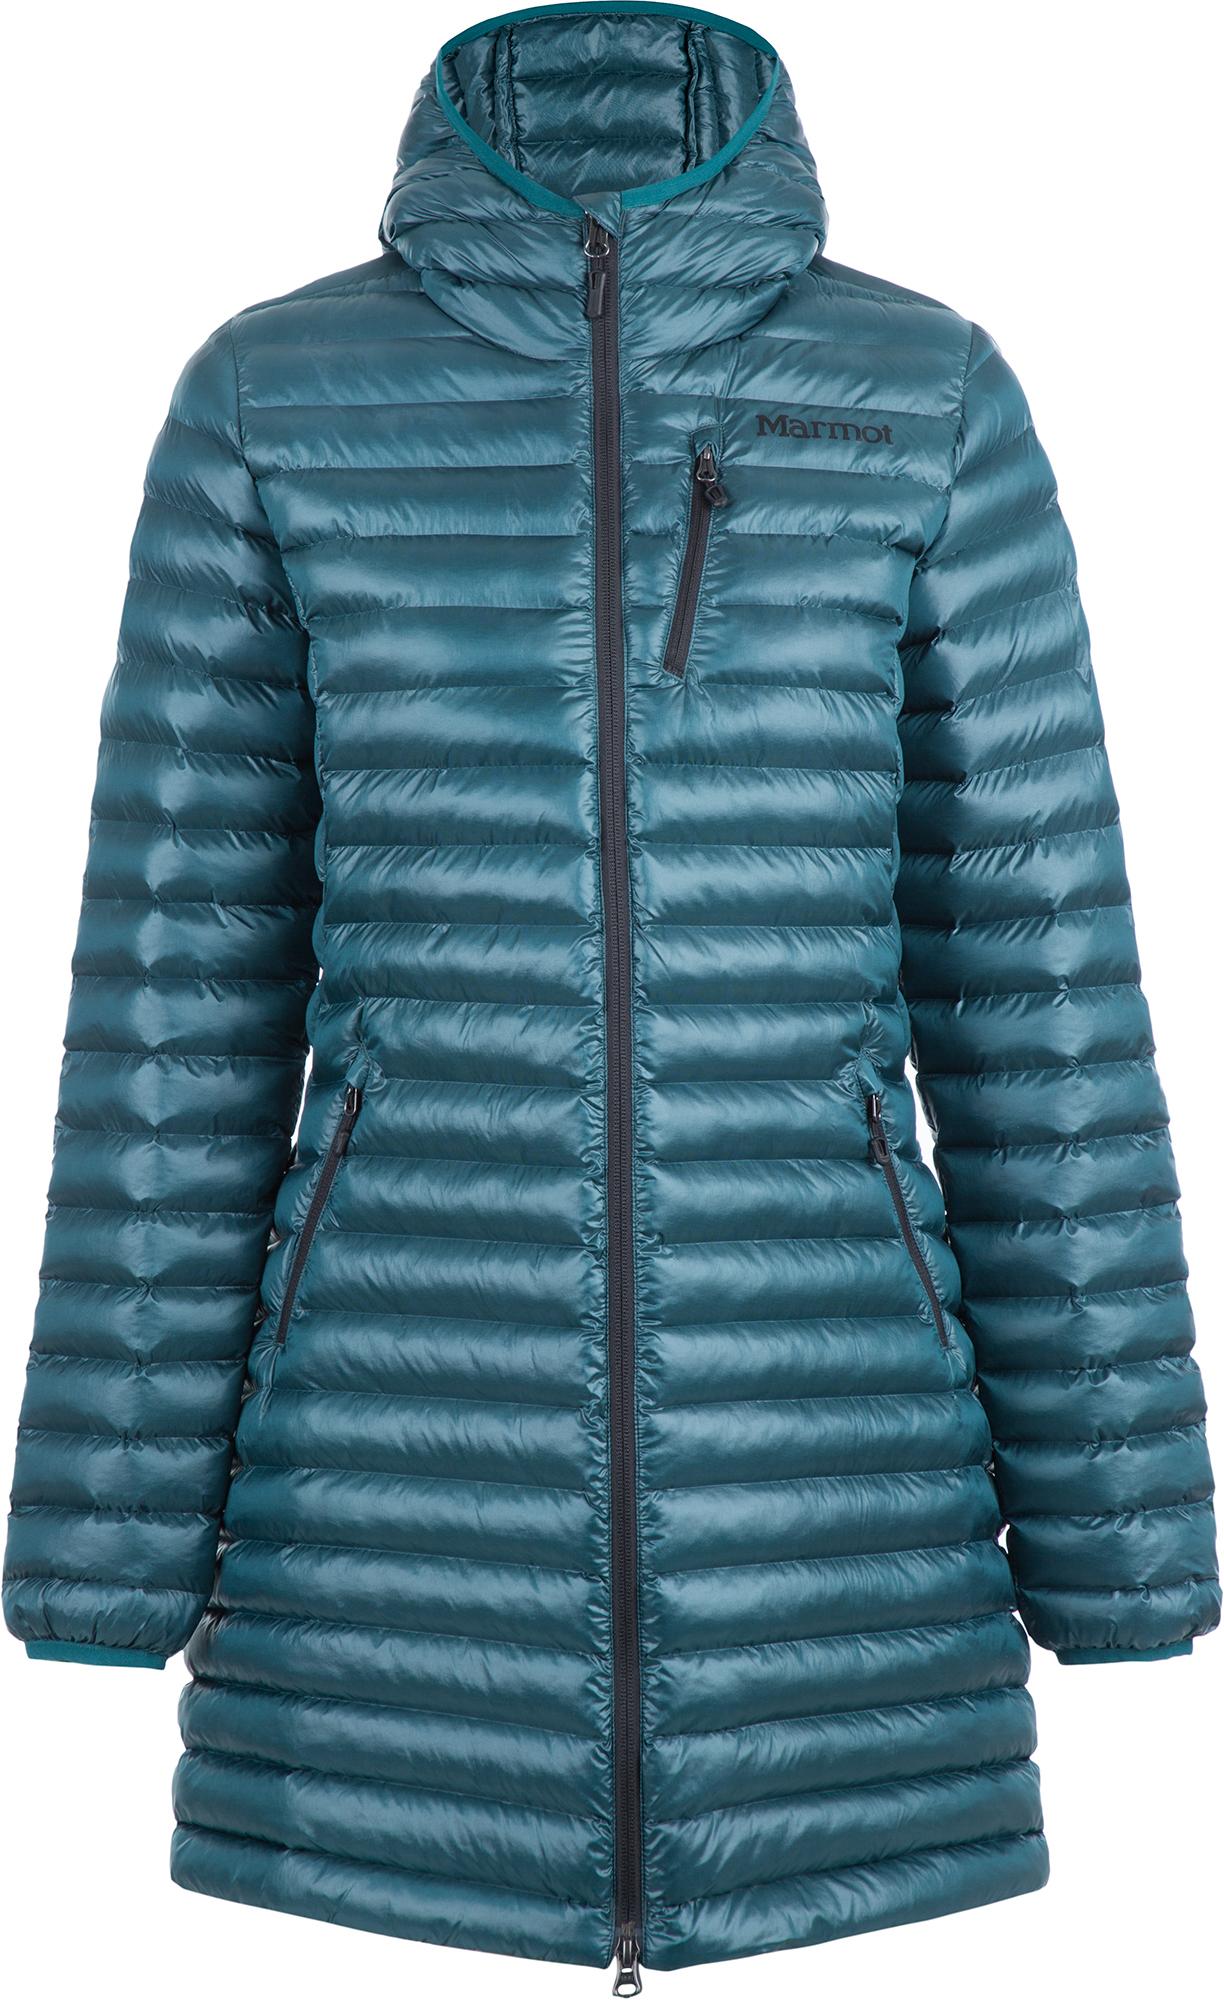 Marmot Куртка утепленная женская Marmot Avant Featherless Hoody, размер 54-56 цена